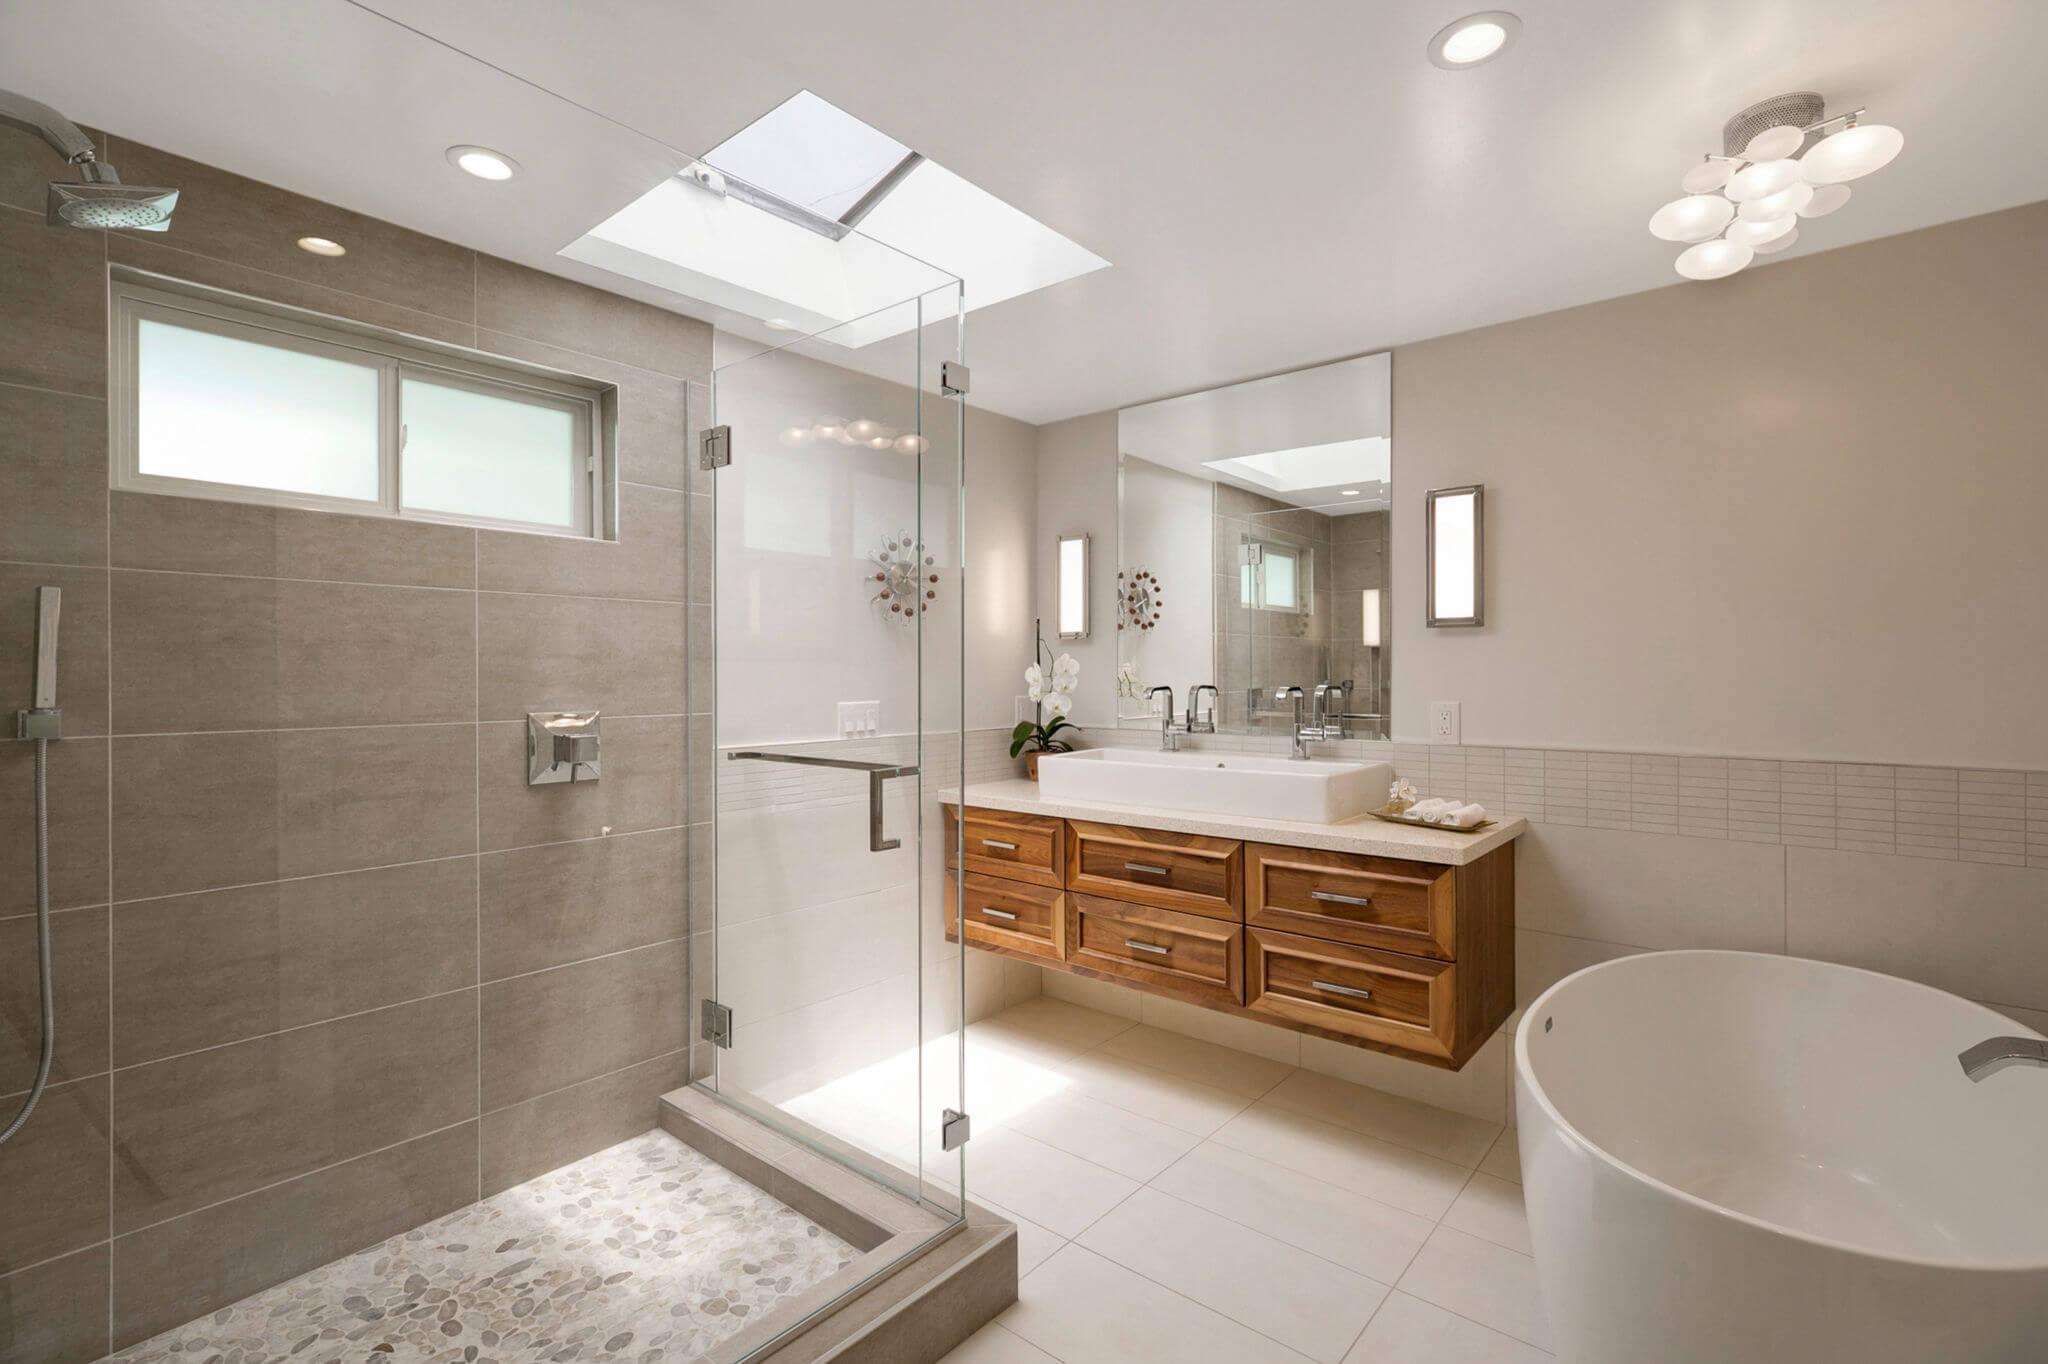 Master Bathroom Remodel Orange County, Master Bathroom Floating Vanity, Transitional Master Bathroom Design